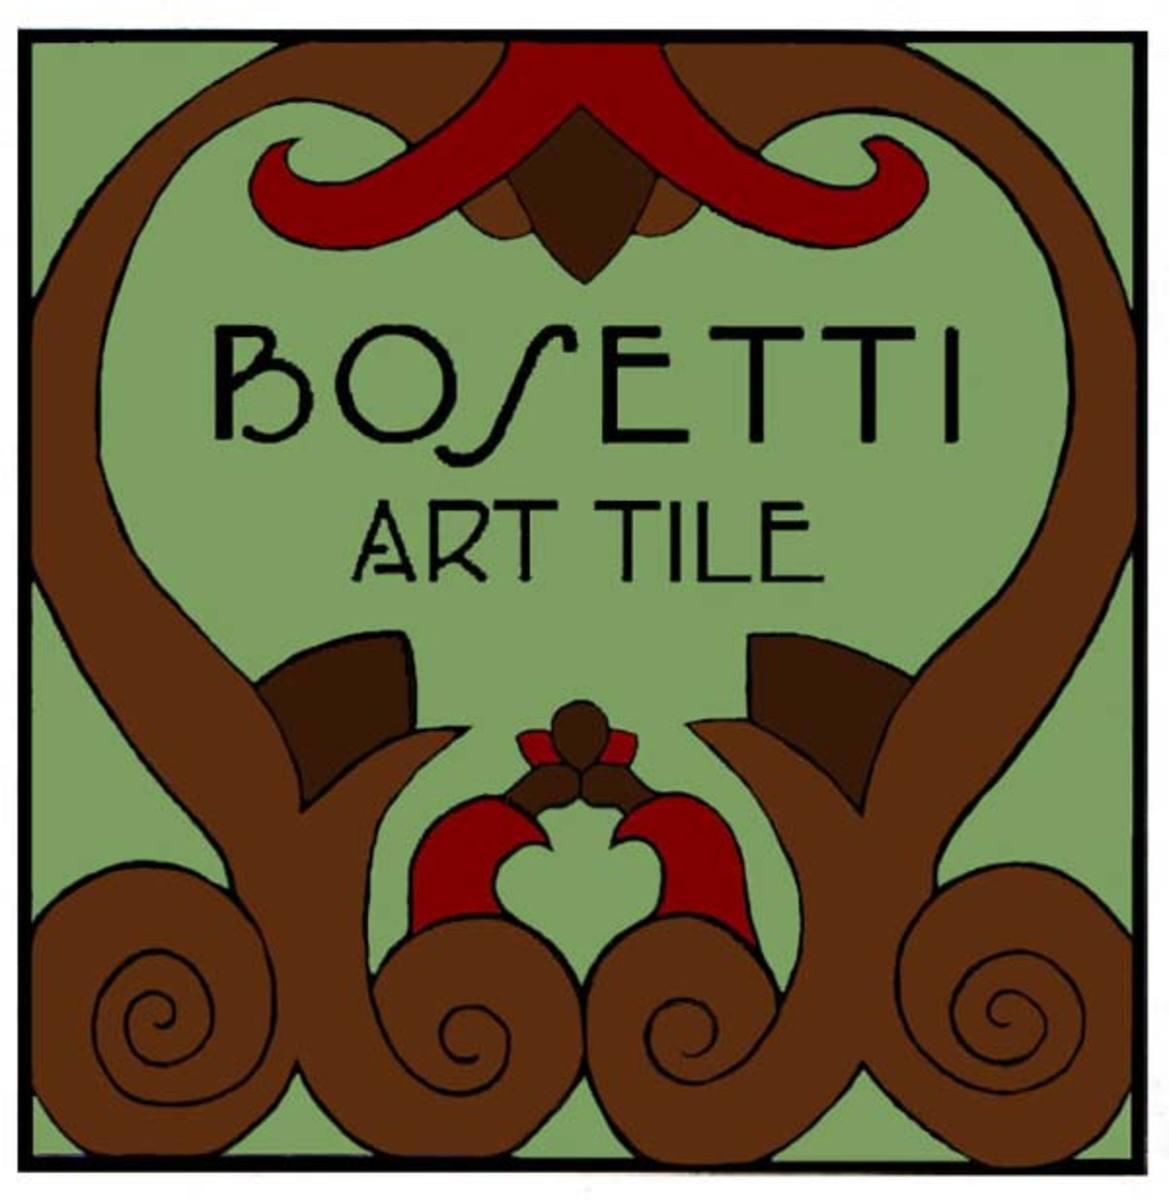 Bosetti-Art-Tile-Color-Logo